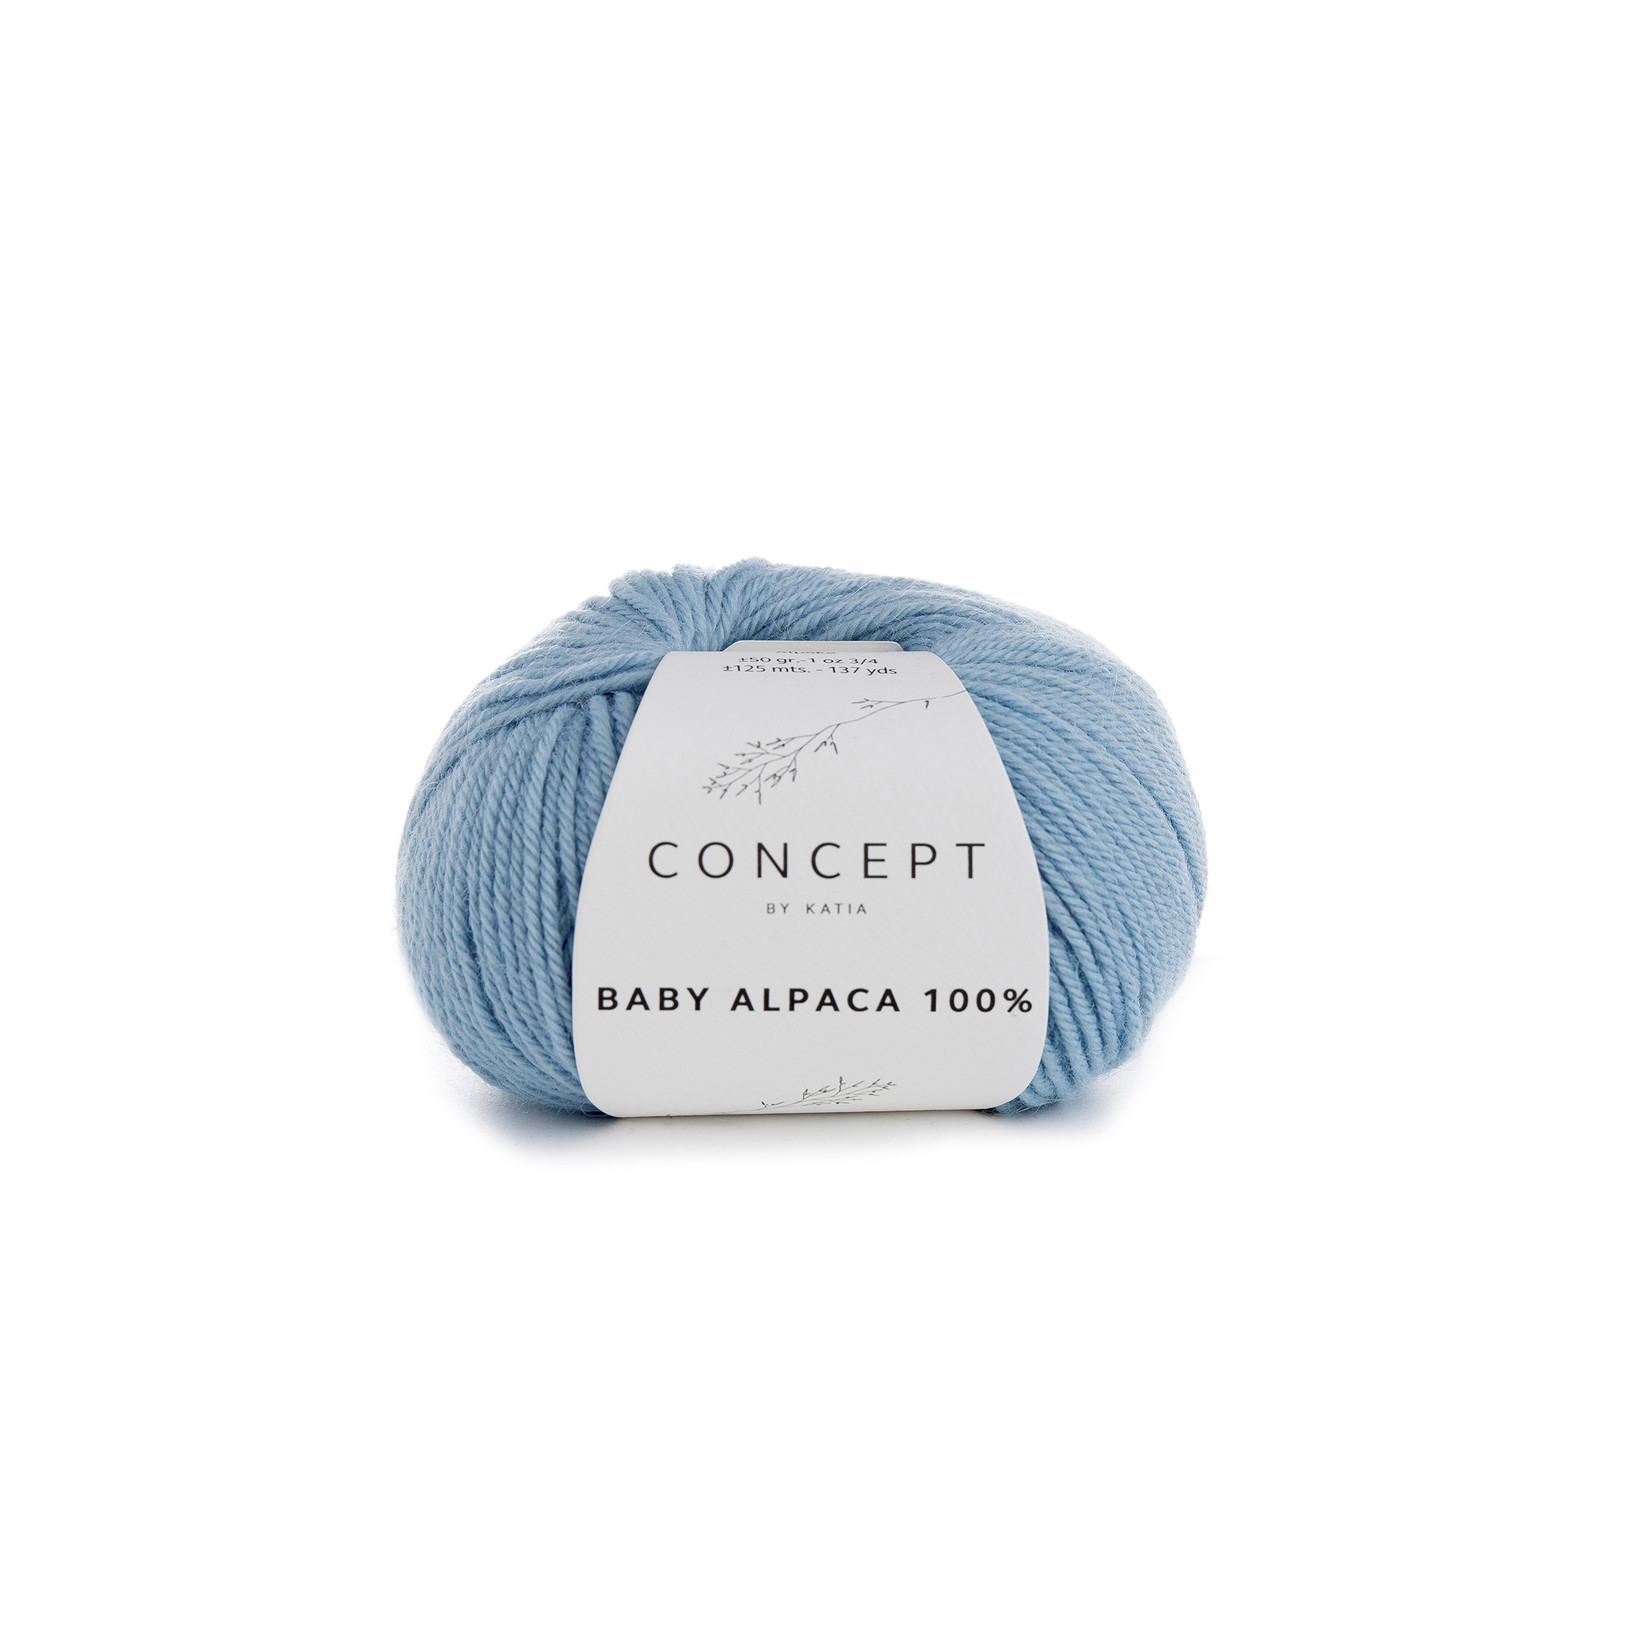 Katia Baby Alpaca 100% - kleur 511 - Hemelsblauw - 50 gr. = 125 m. - 100% Baby Alpaca